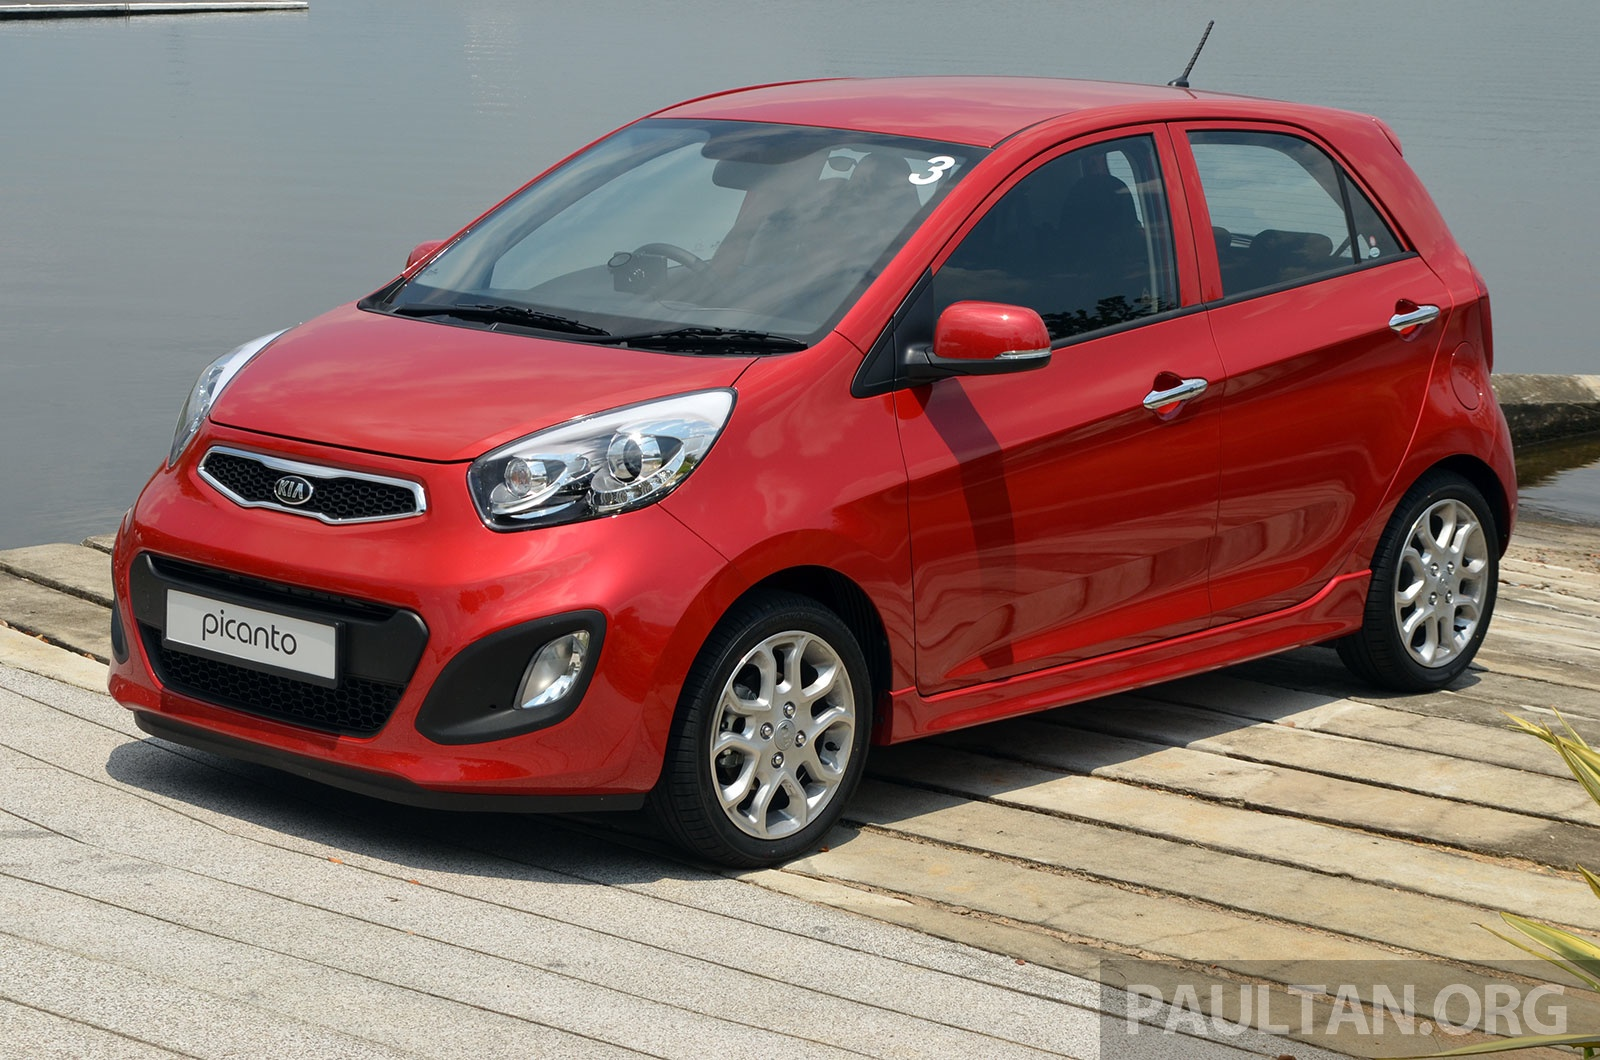 (IMG:http://s4.paultan.org/image/2013/10/Kia-Picanto-Malaysia-20.jpg)